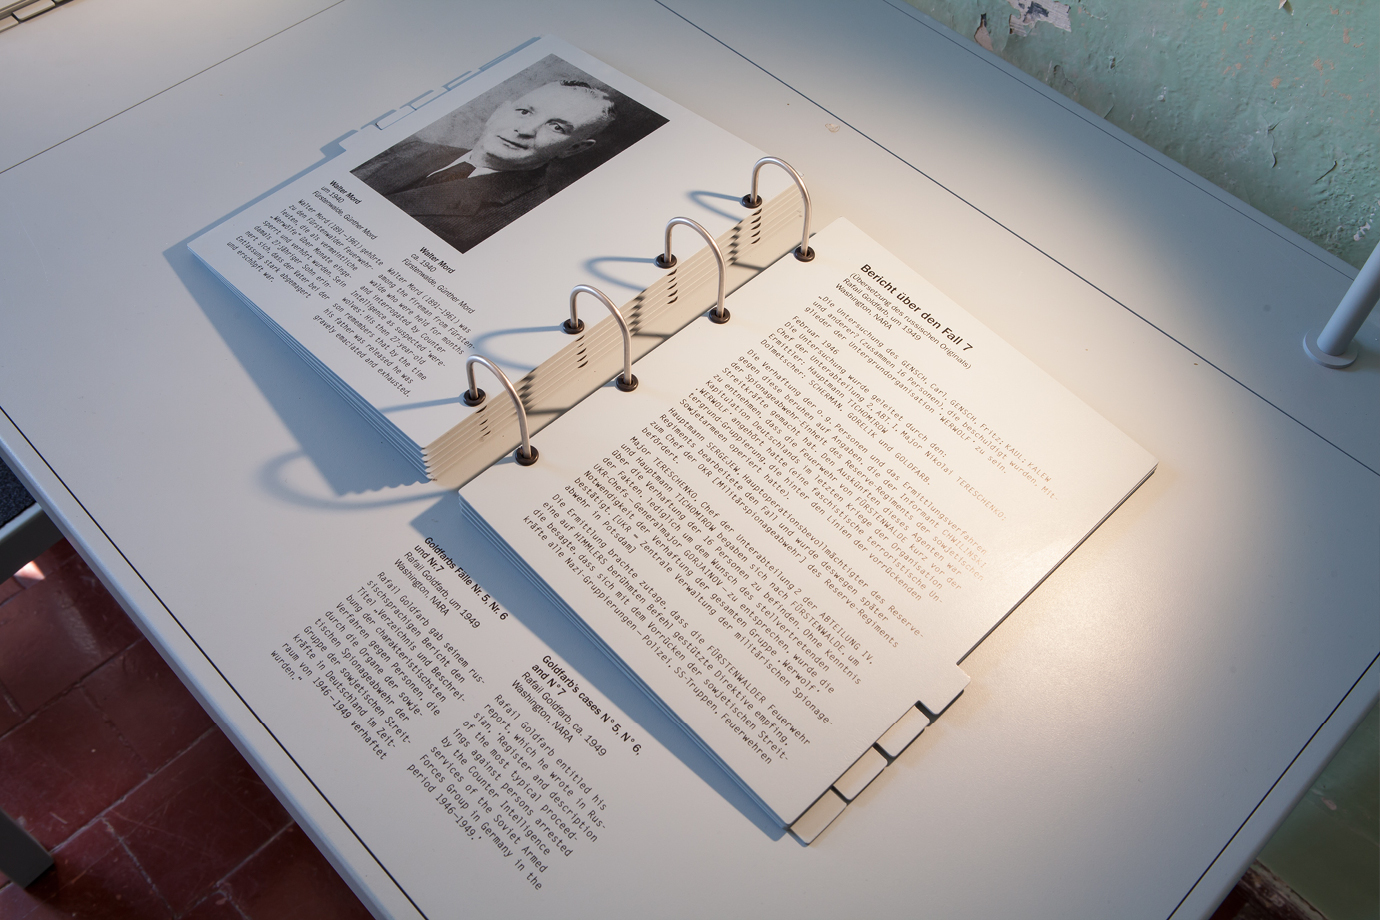 http://e-o-t.de/wordpress/wp-content/uploads/2017/04/2012_eot-Leistikow-Exhibition-11.jpg